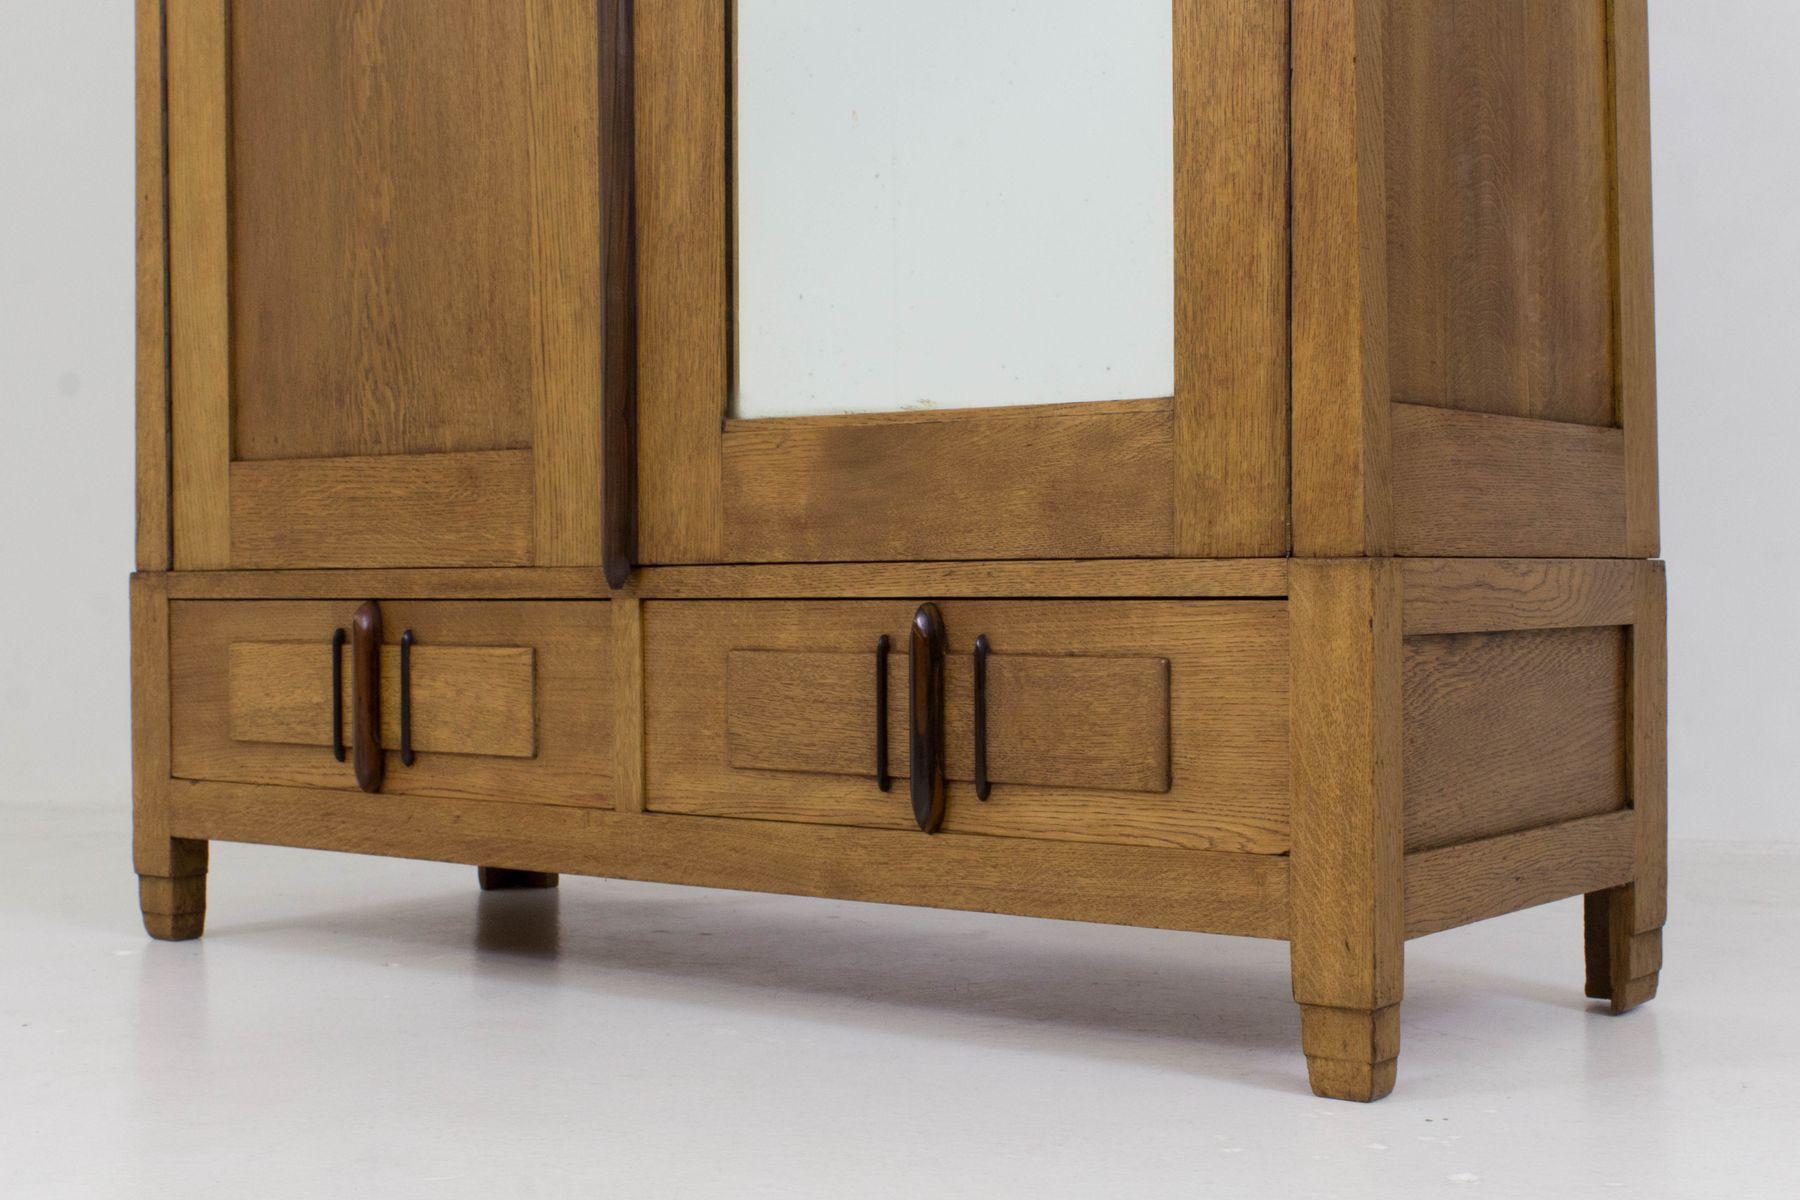 art deco amsterdam school armoire by j j zijfers 1920s. Black Bedroom Furniture Sets. Home Design Ideas